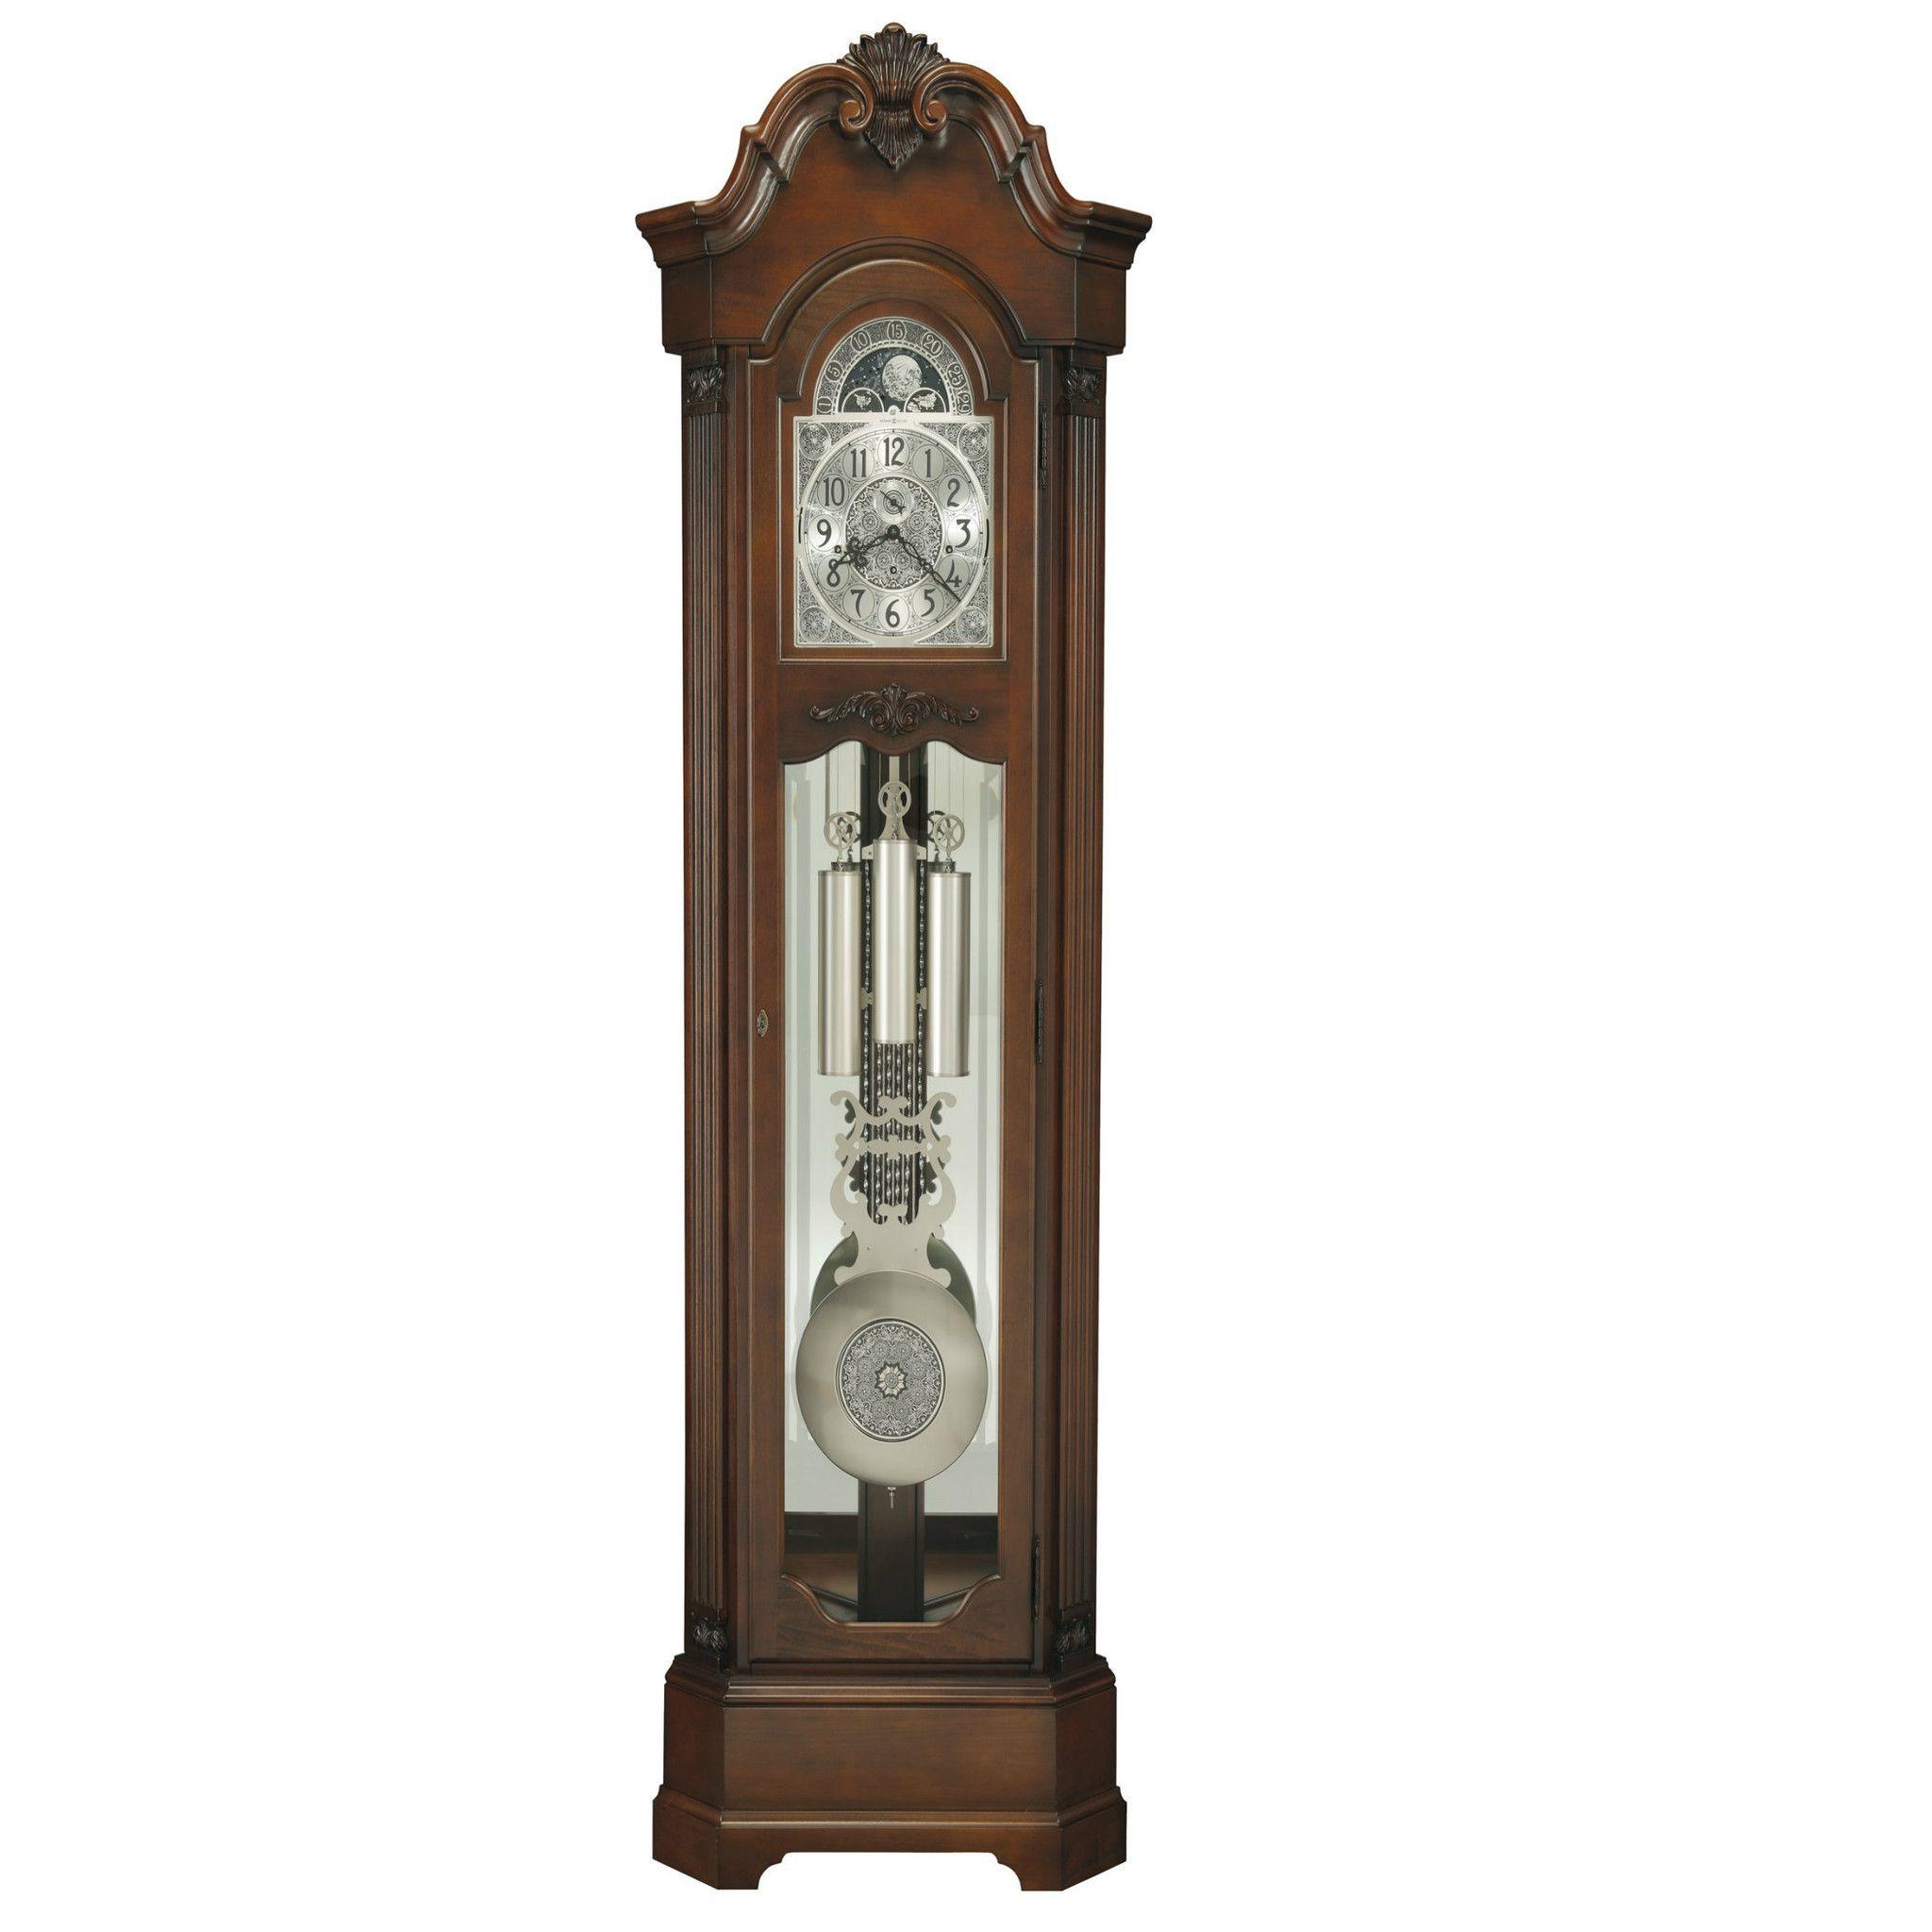 Ridgeway Cabris Grandfather Clock 2574